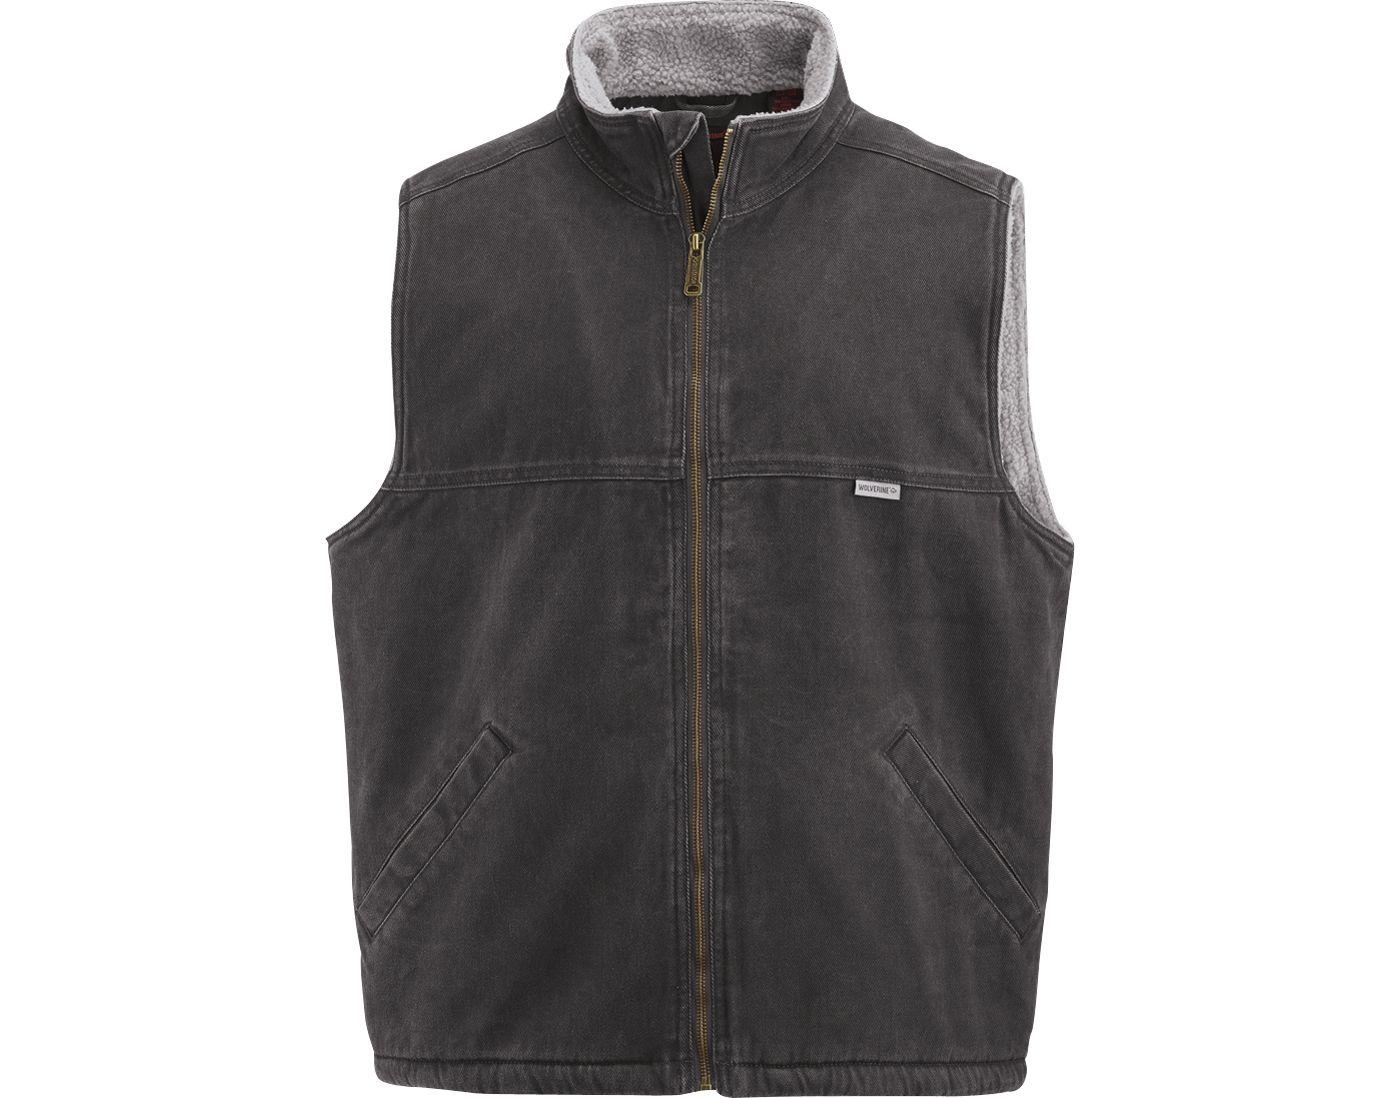 Wolverine Men's Upland Vest (Regular and Big & Tall)